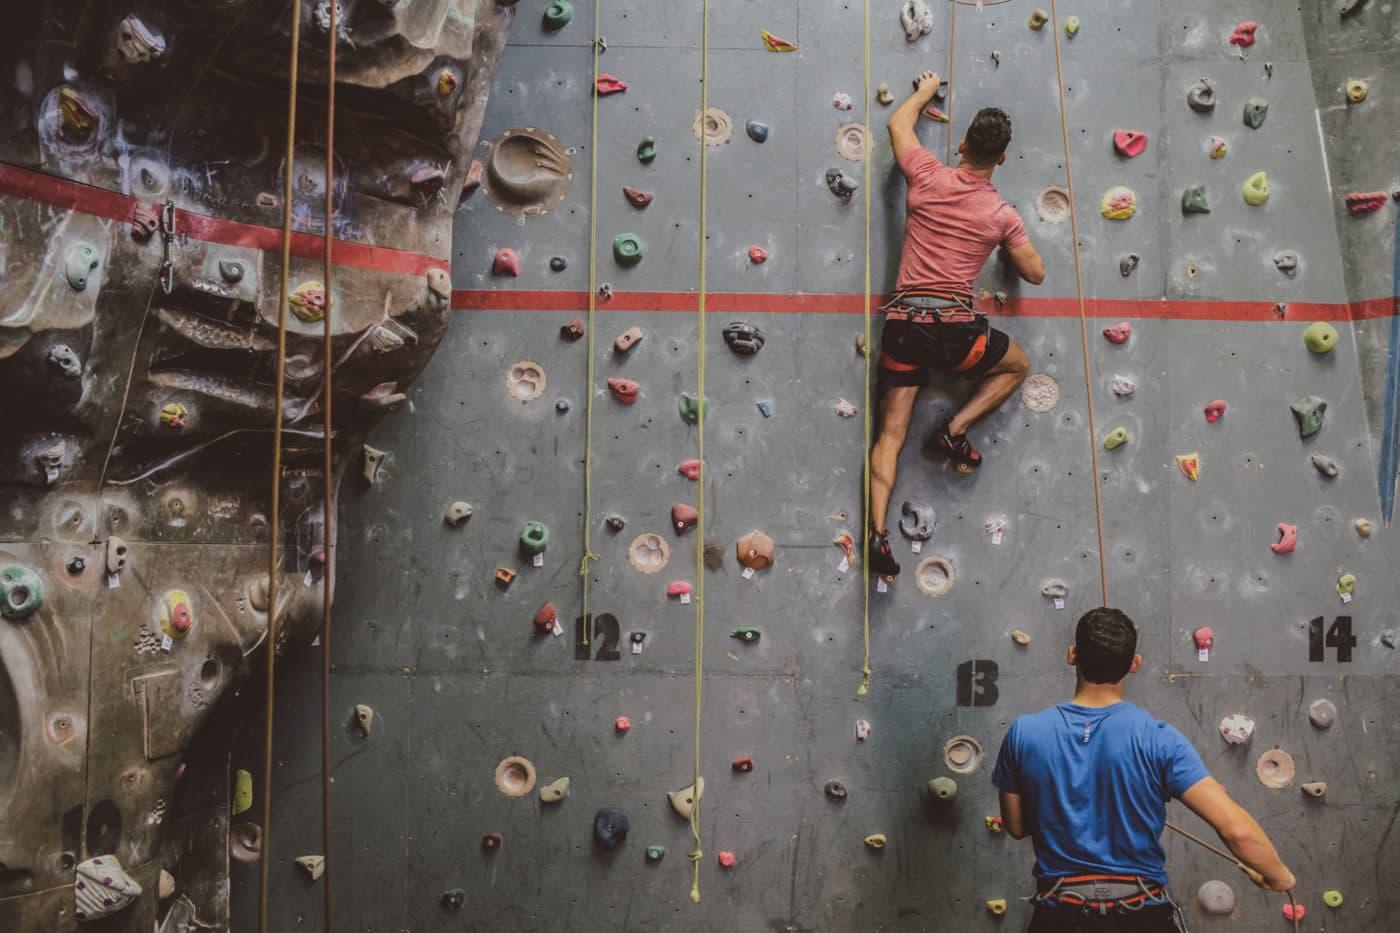 climbing wall - delegates offer